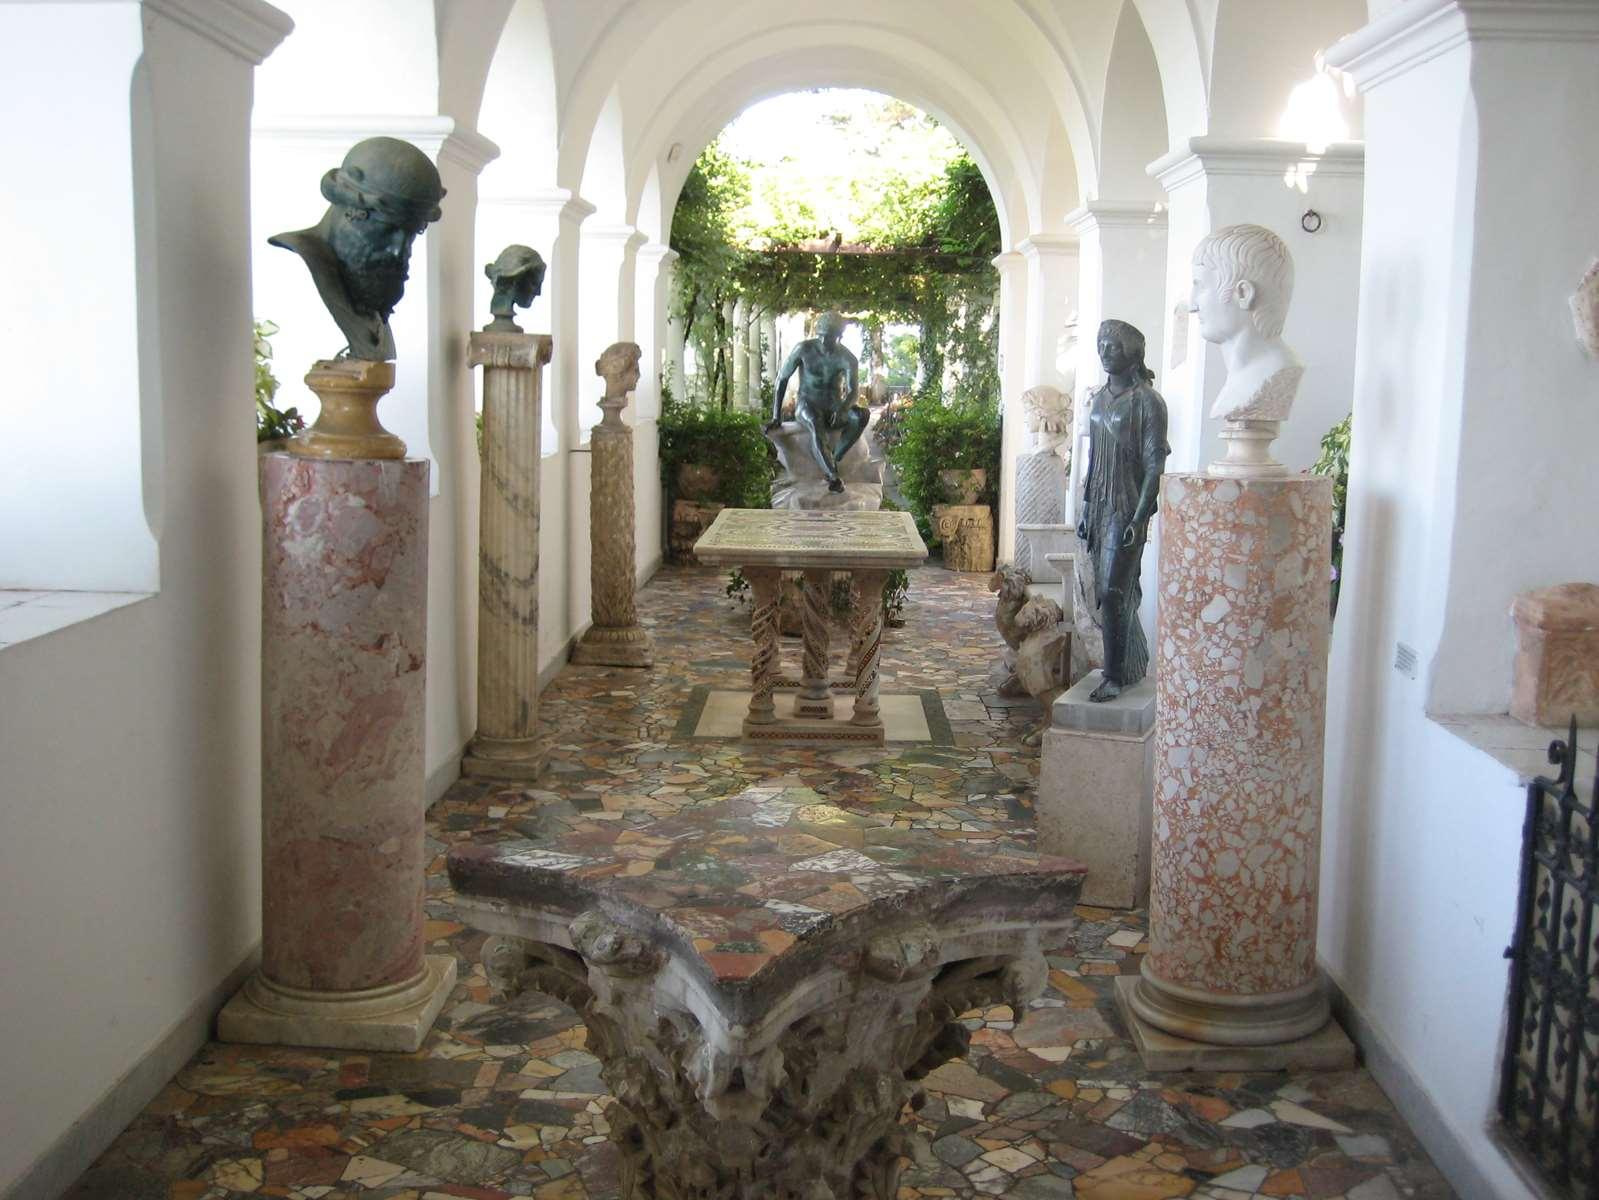 Italie-Capri Villa Axel Munthe